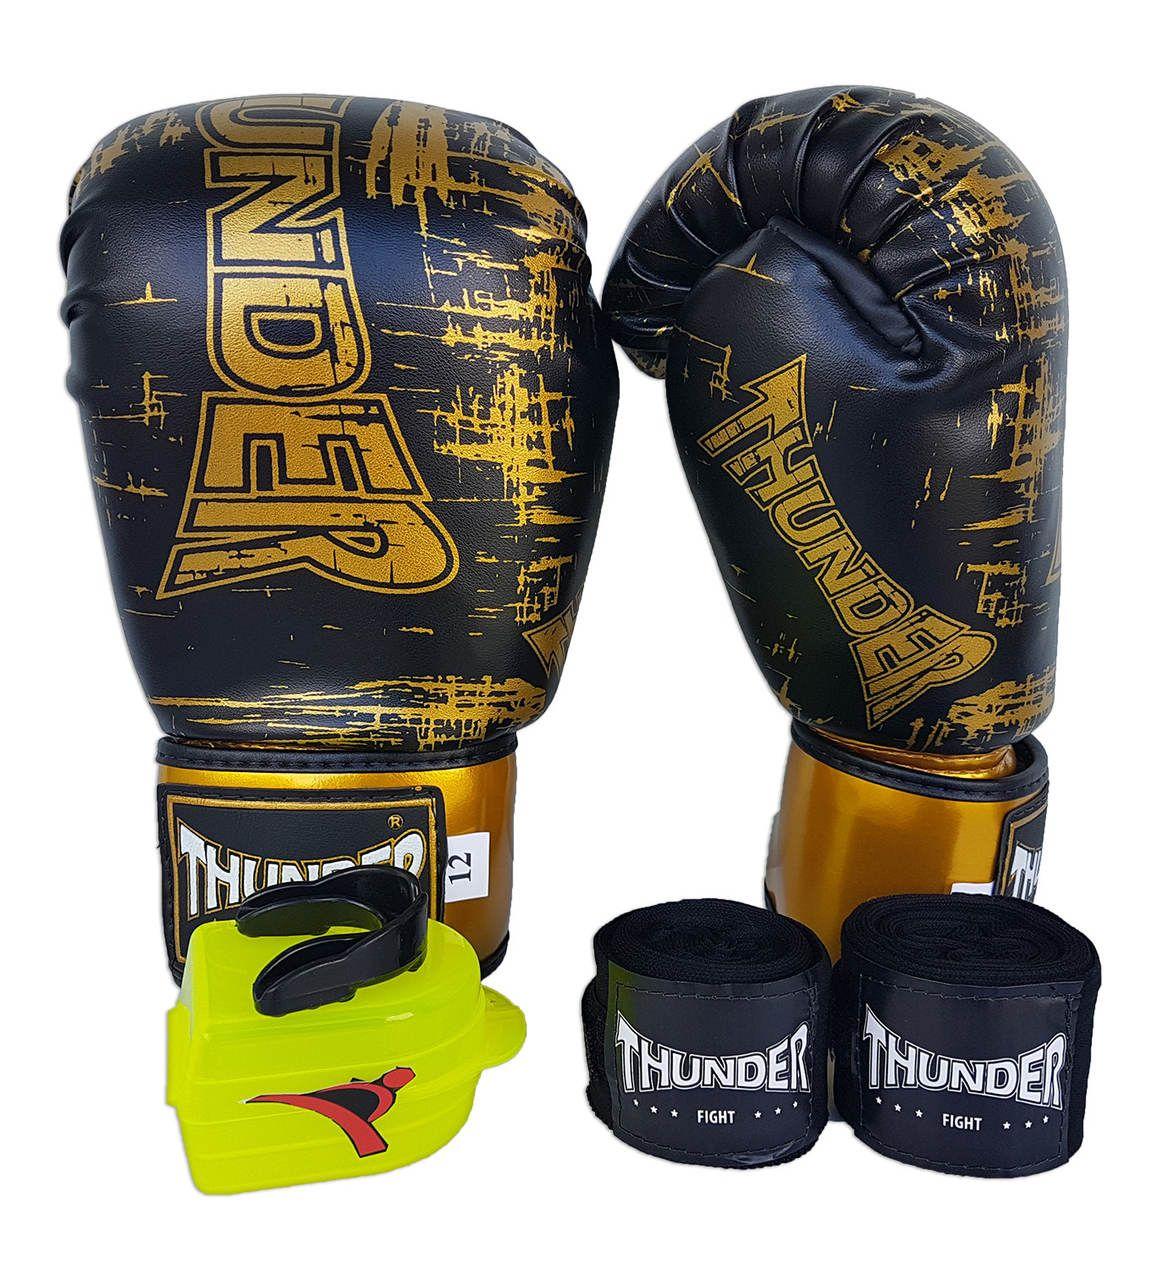 Kit de Boxe / Muay Thai 12oz - Preto Riscado - Thunder Fight   - PRALUTA SHOP